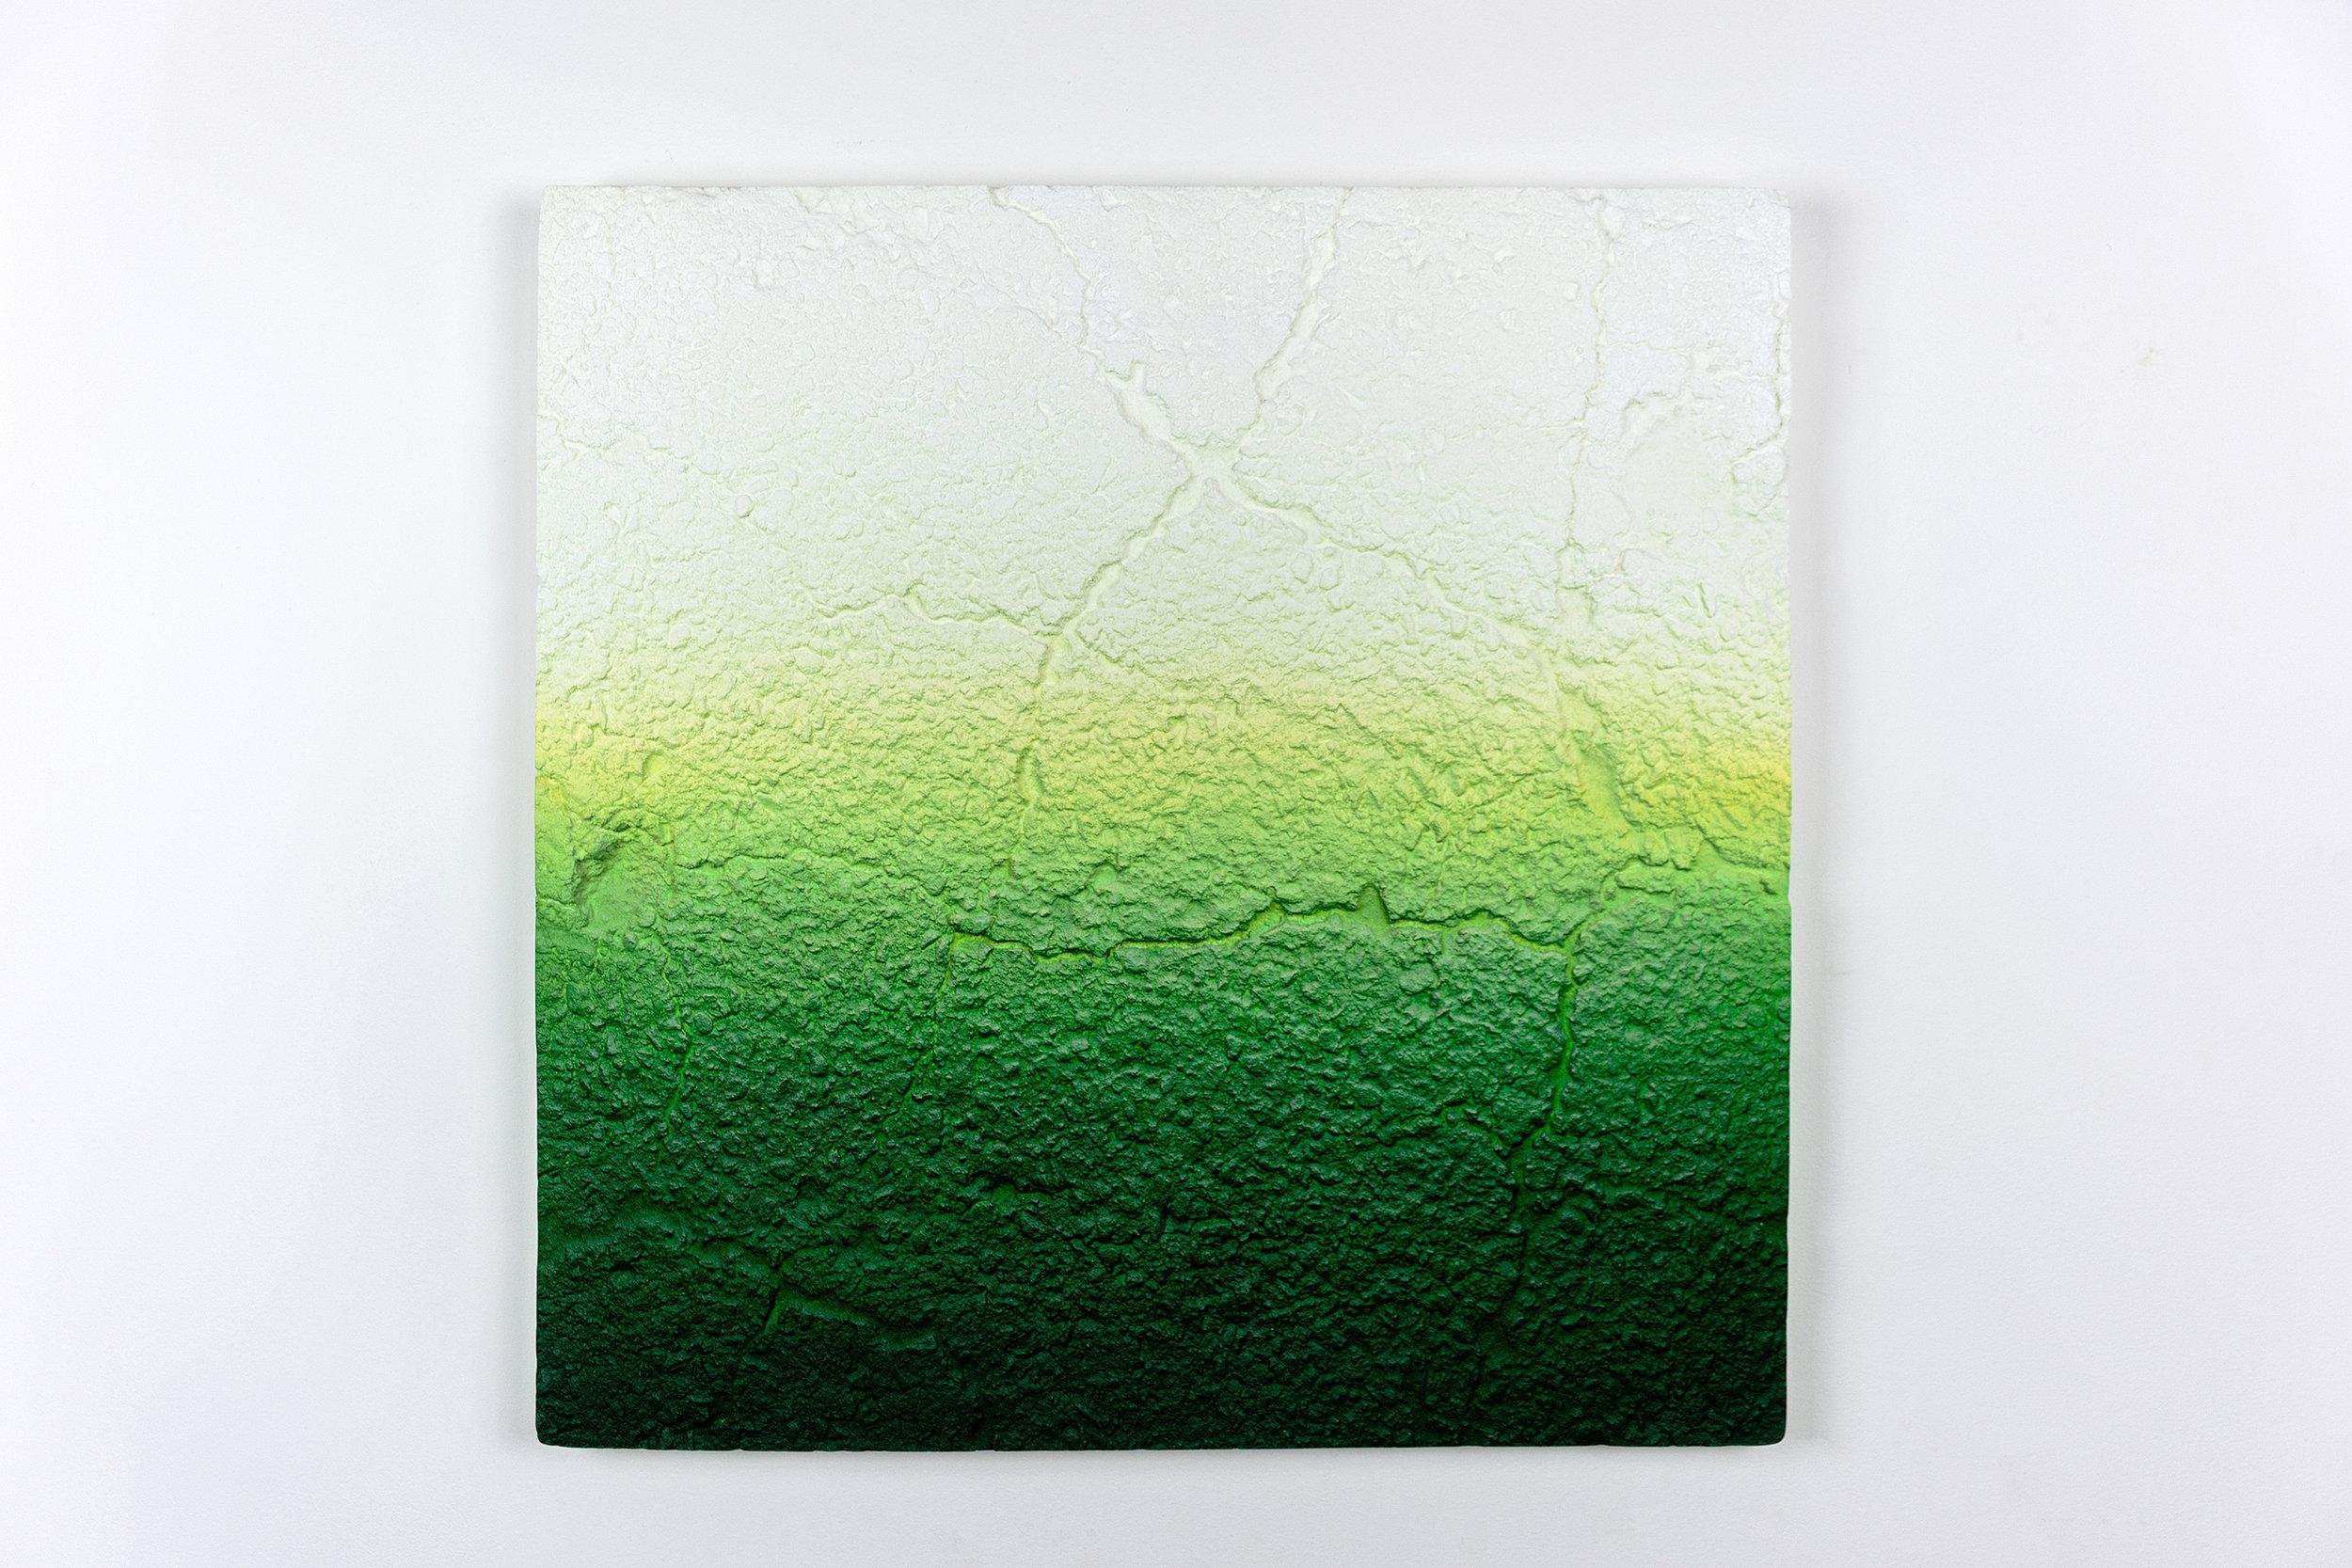 New Landscape Painting #02 [Toxic Algae Bloom]